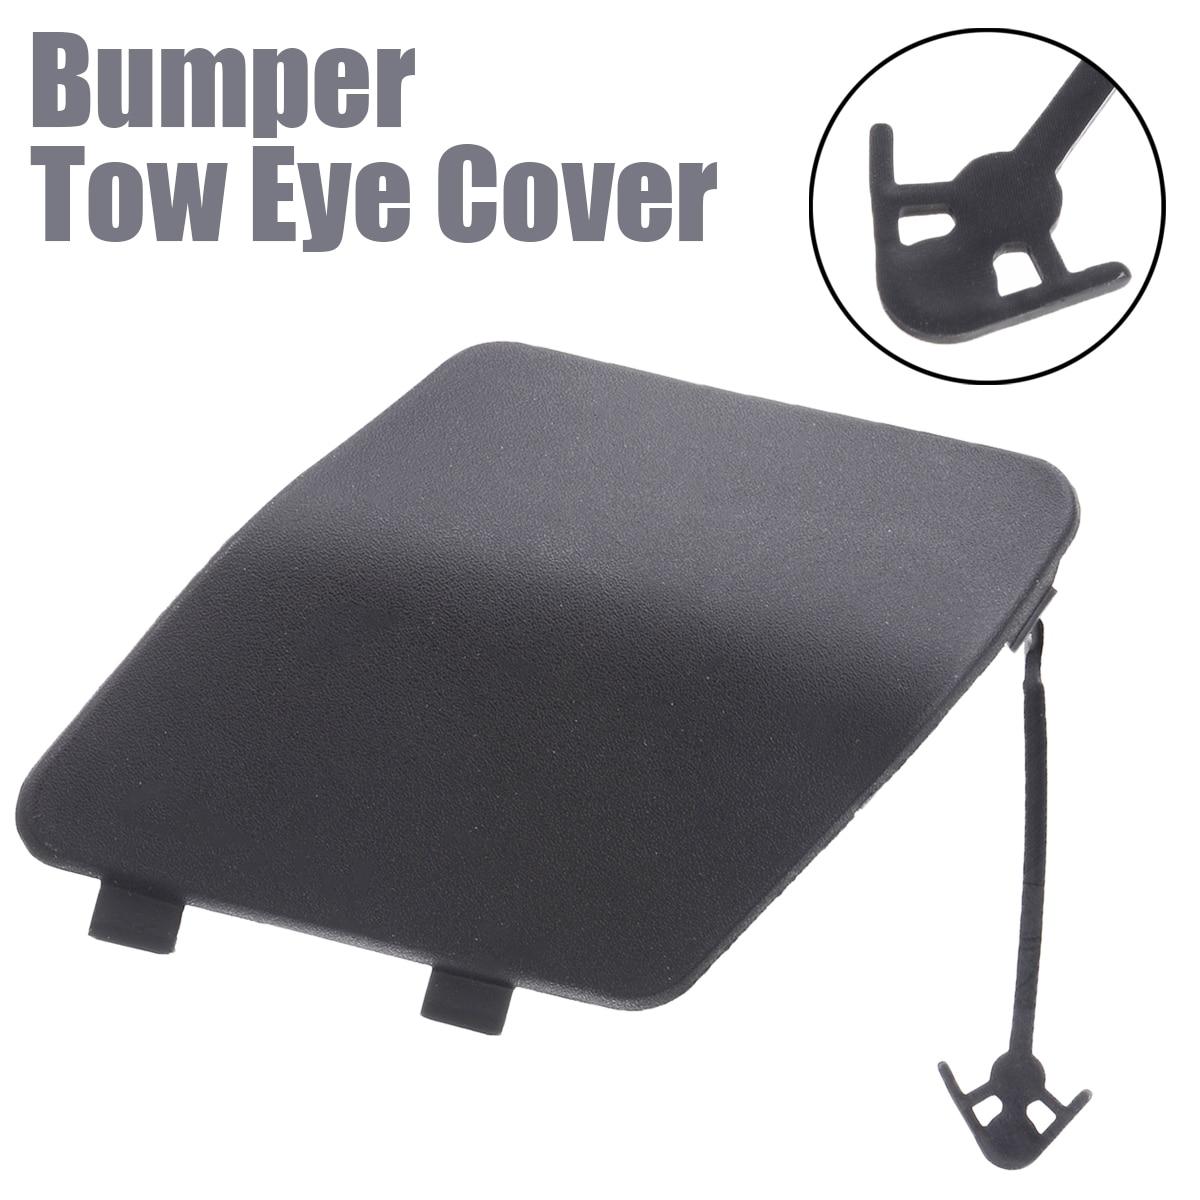 Novo 1 pçs preto pára-choques tow eye hook capa tampa a406 amortecedor traseiro do carro gancho de reboque para nissan para vauxhall